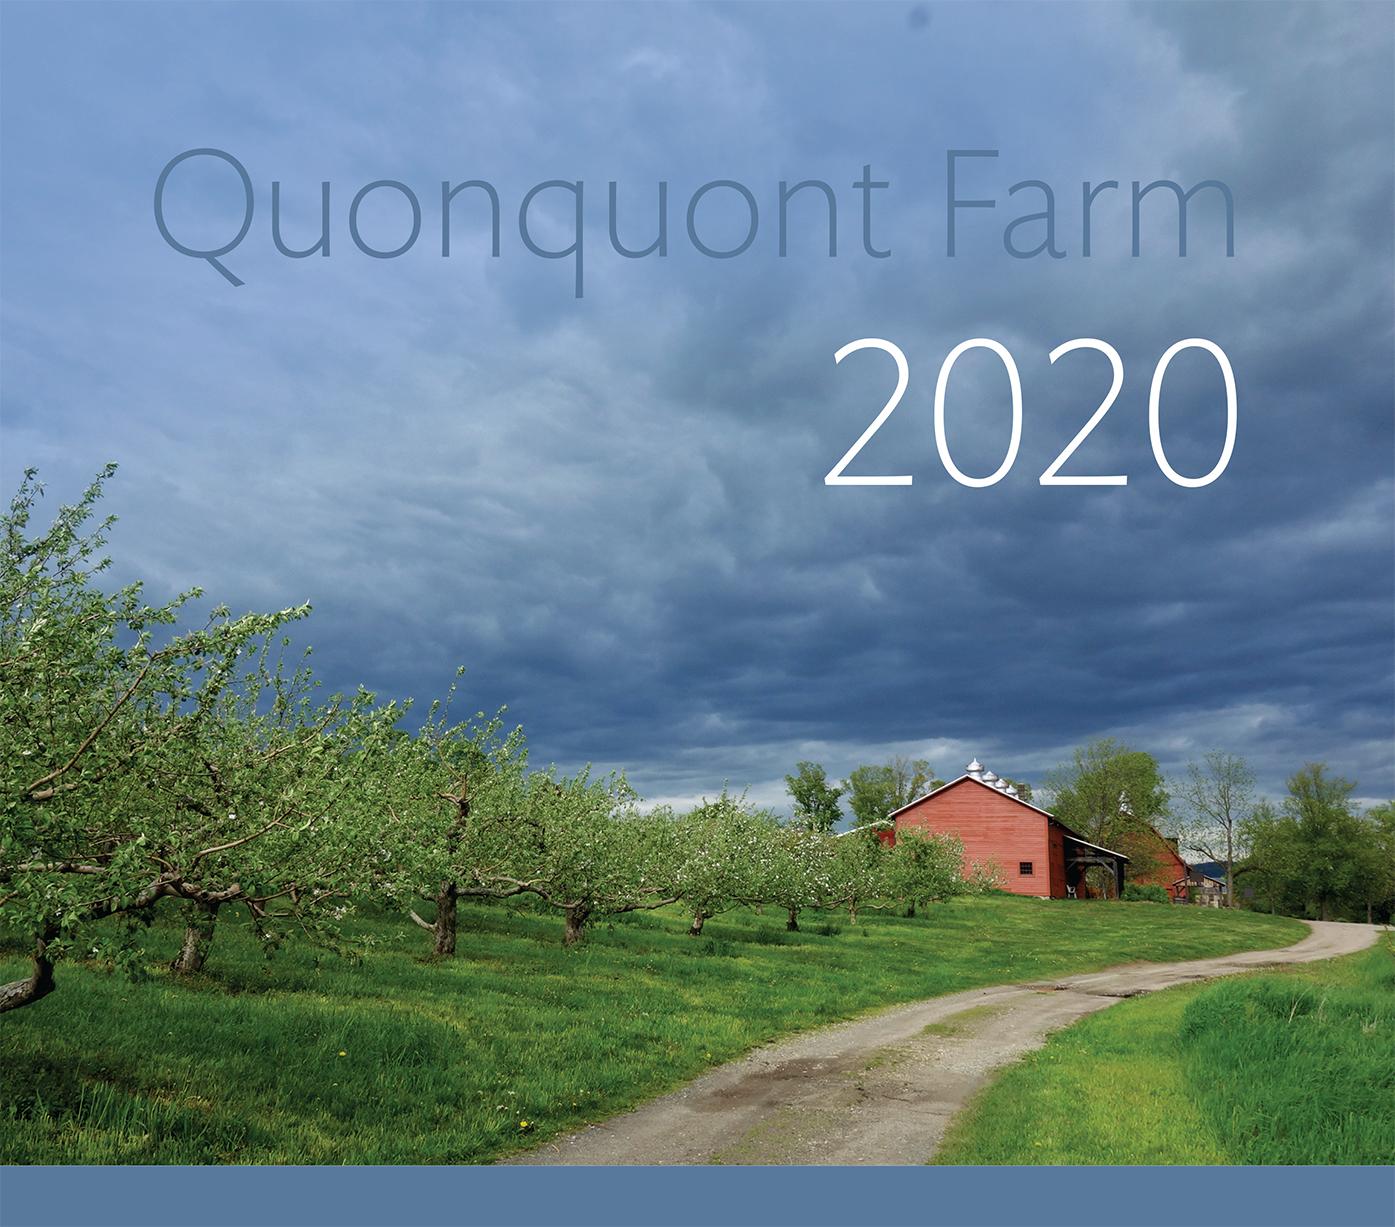 Quonquont Farm 2020 Wall Calendar